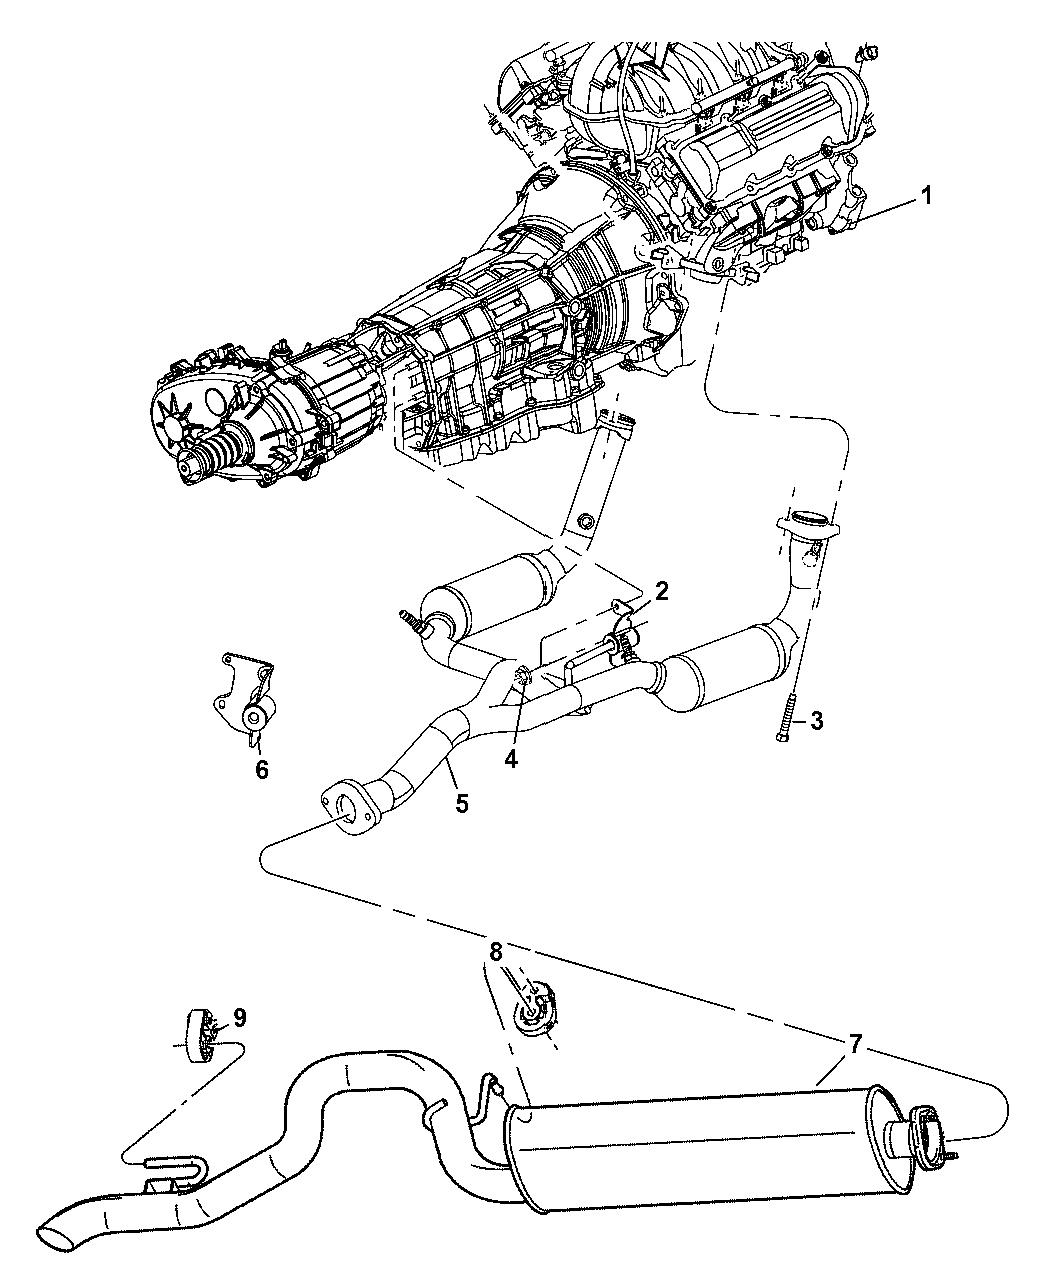 2005 Jeep Liberty Exhaust System - Thumbnail 3